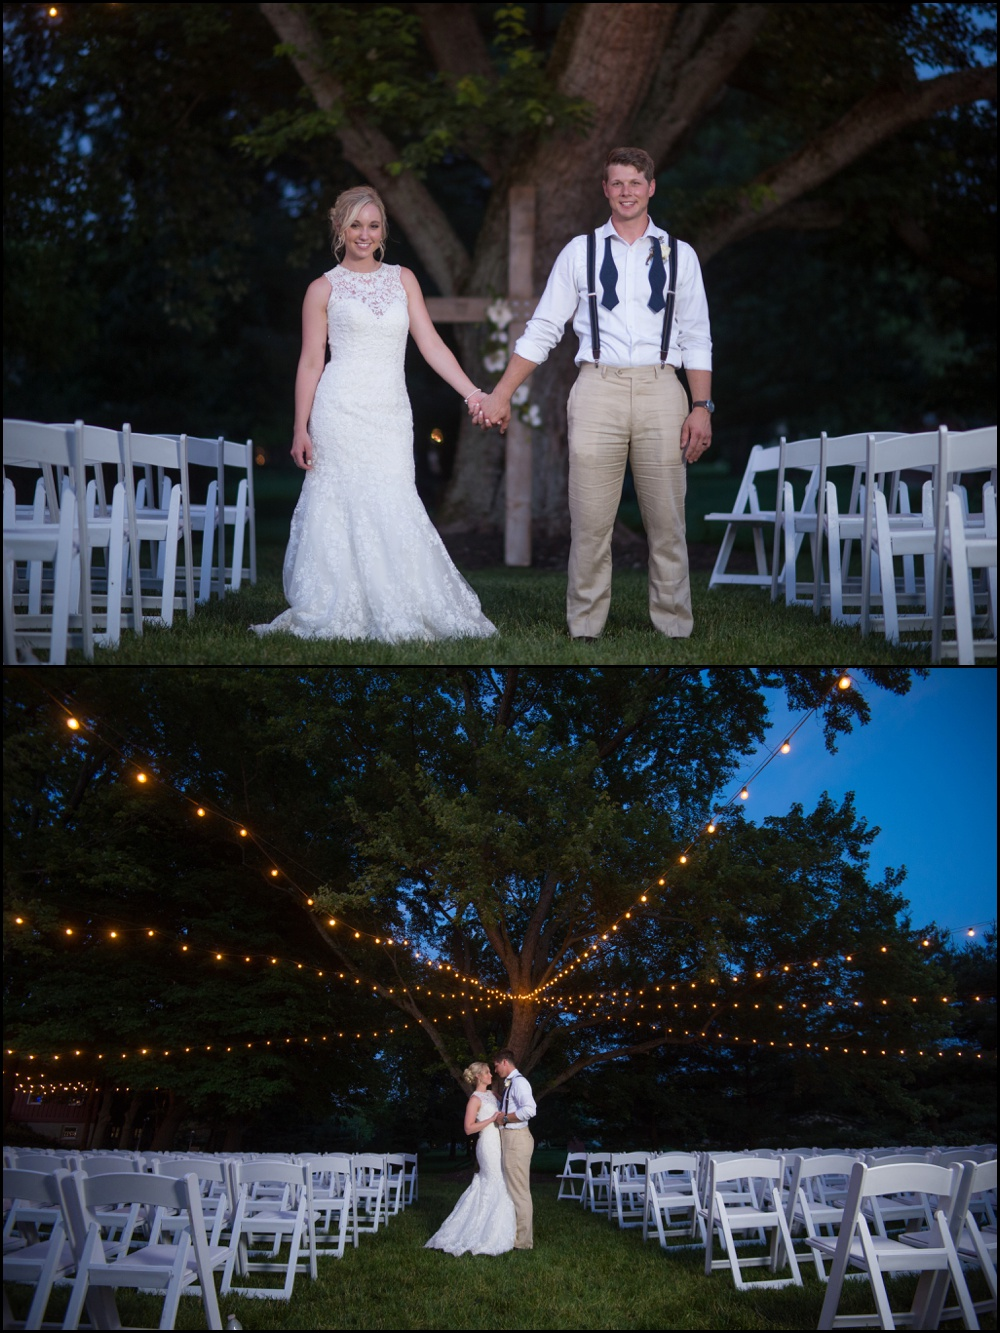 Mustard Seed Garden Wedding Pictures-036.jpg